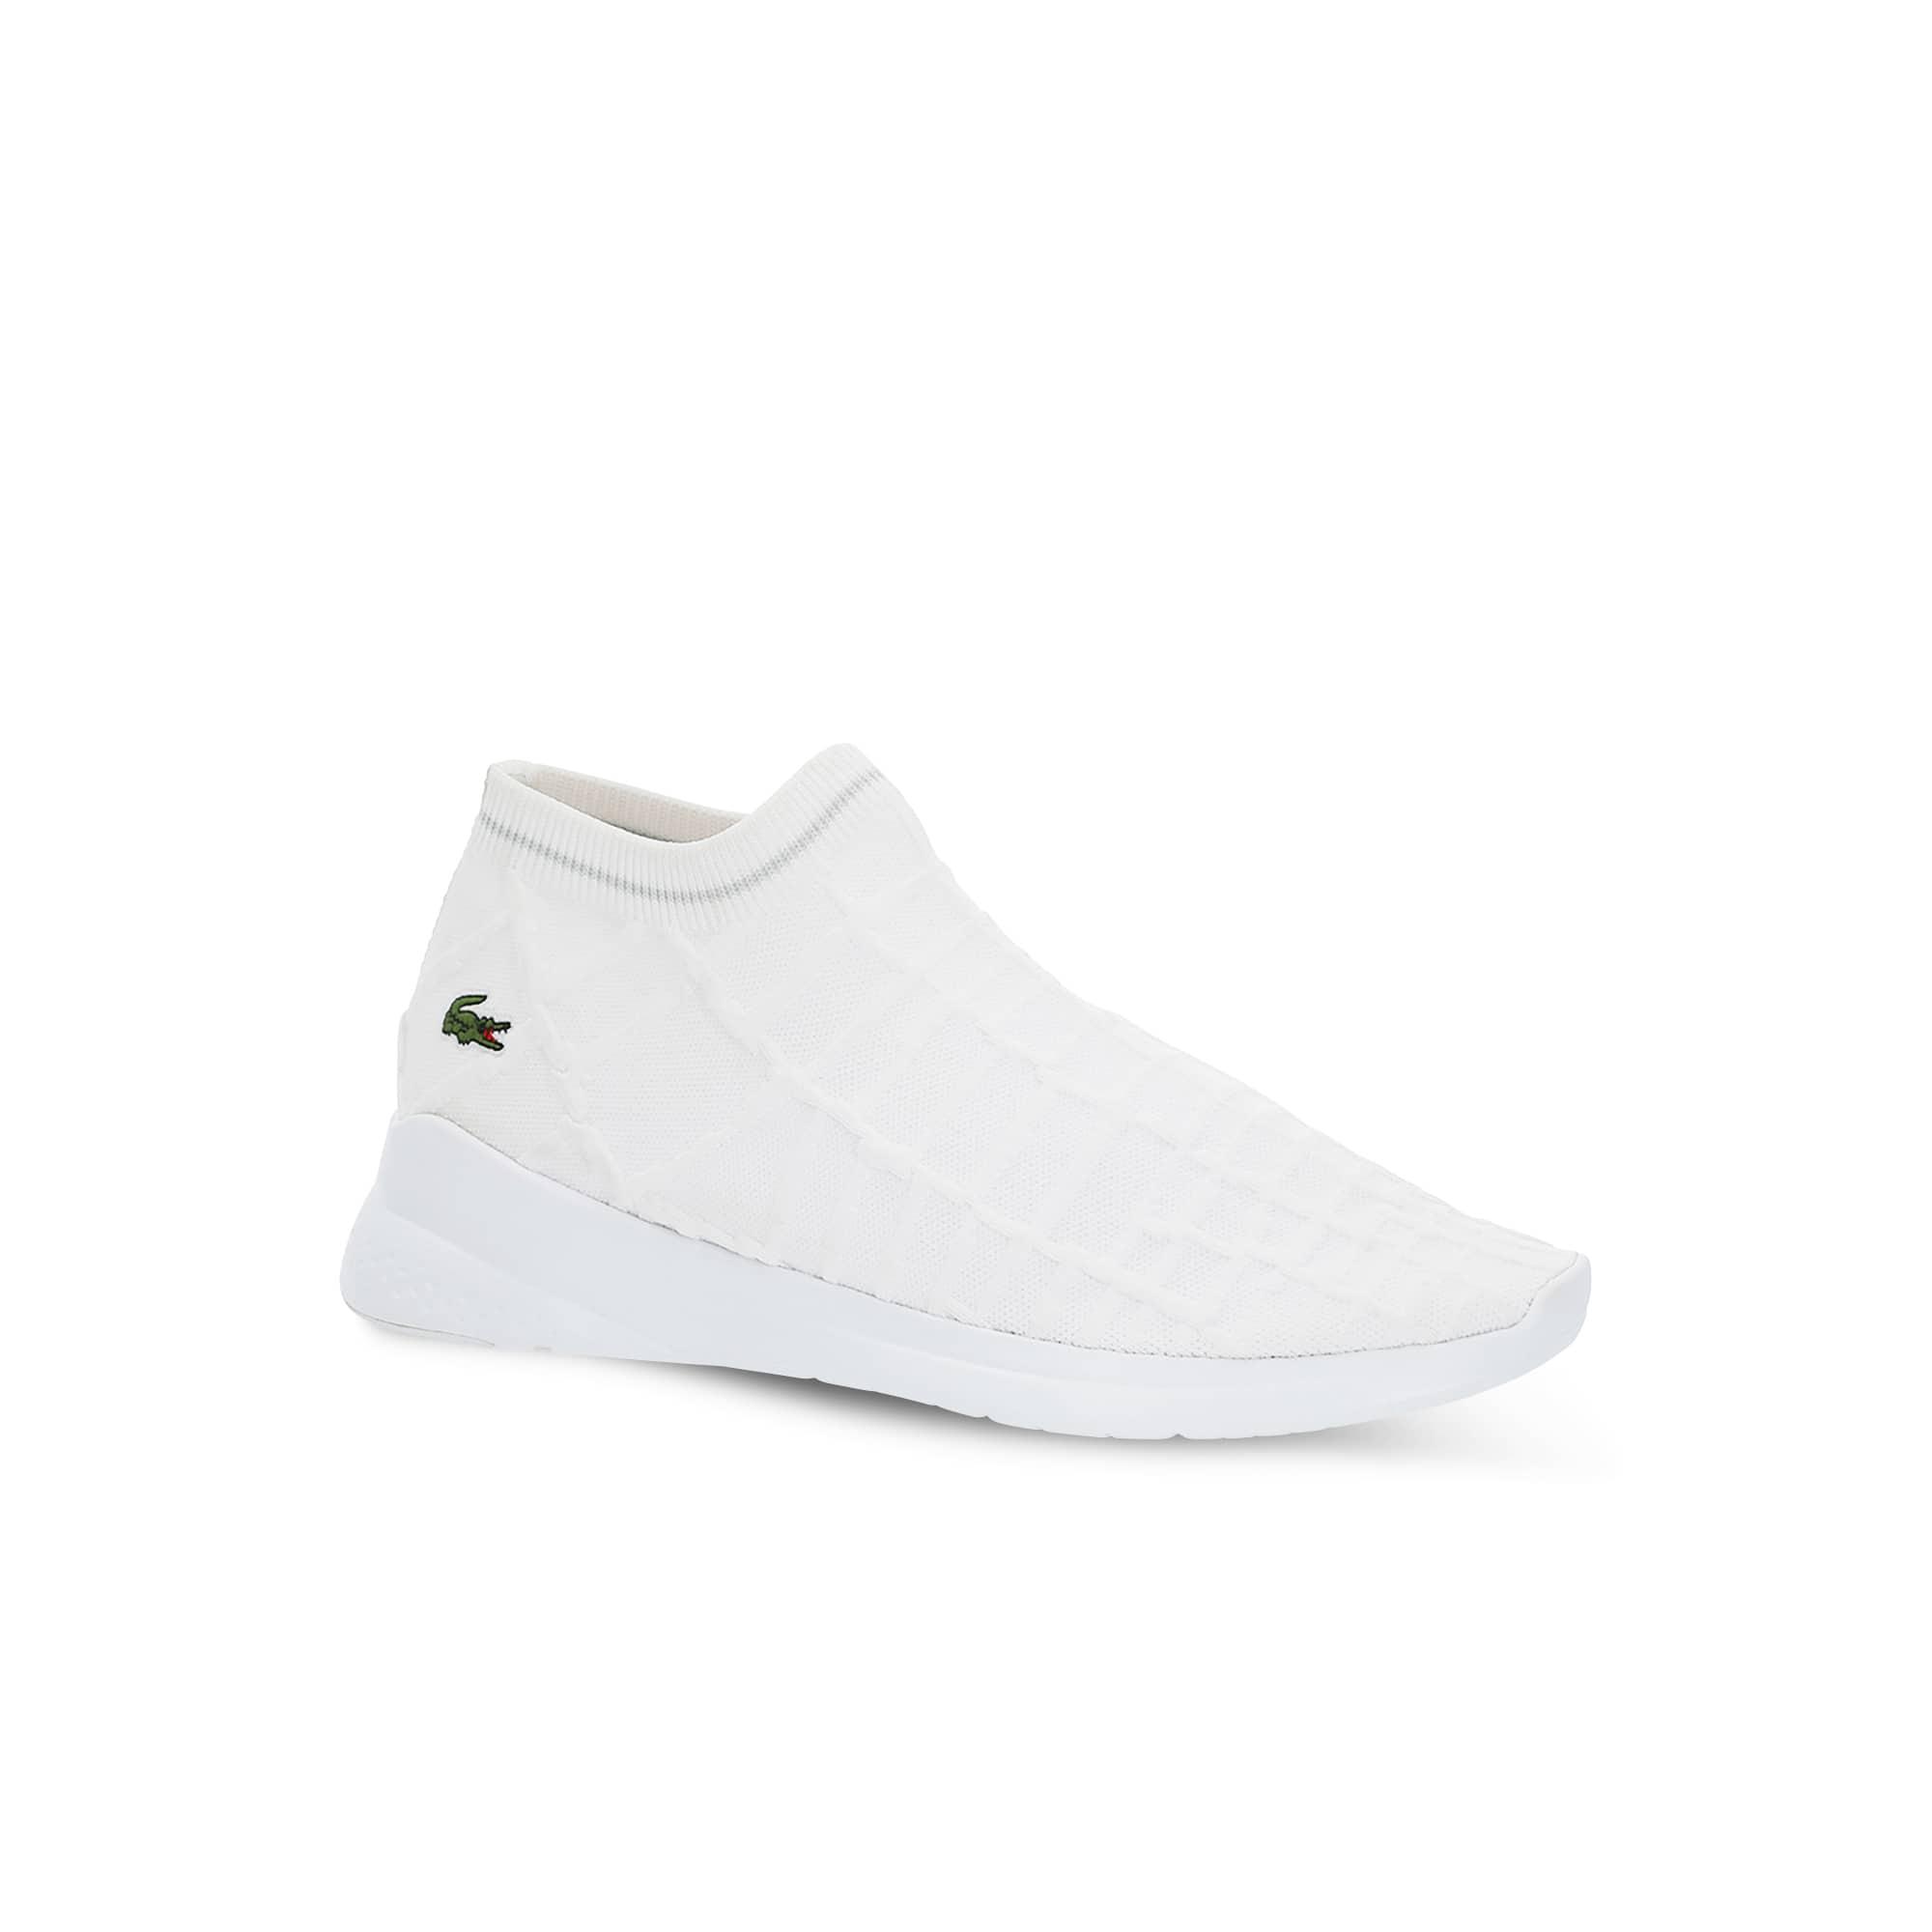 c4e19594e388 Lacoste shoes for men  Sneakers